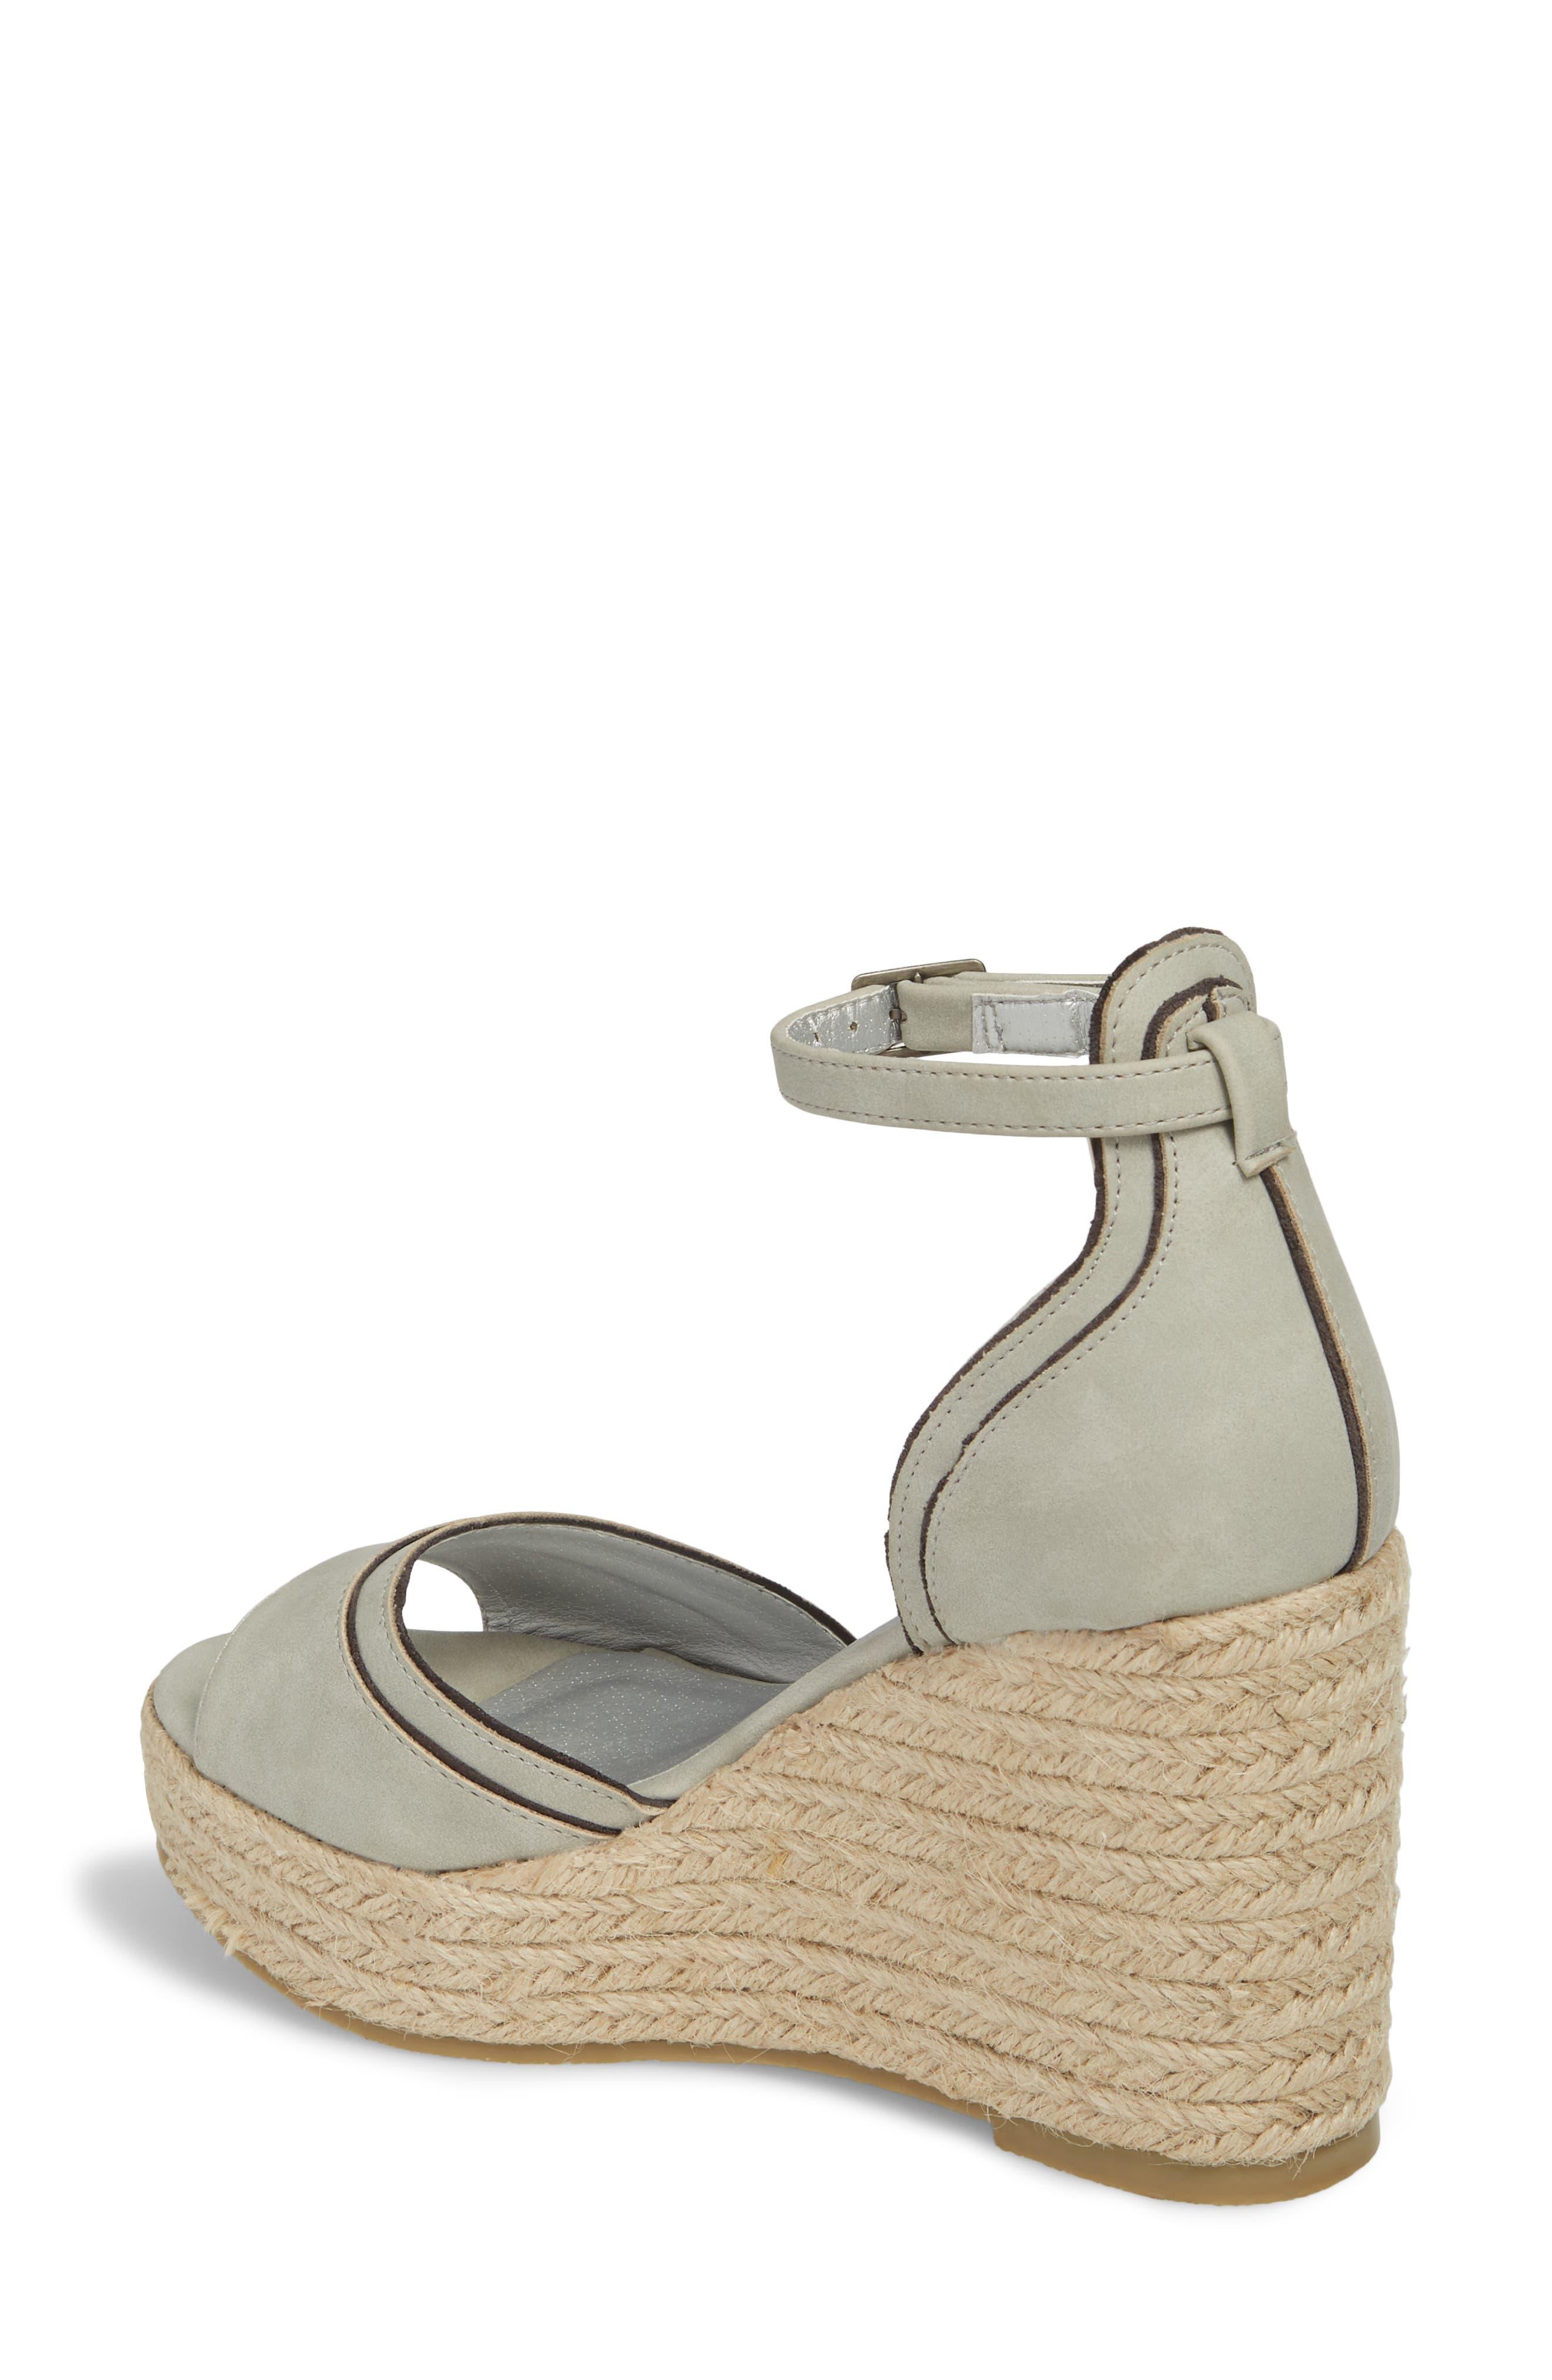 Bon Voyage Espadrille Wedge Sandal,                             Alternate thumbnail 2, color,                             Grey Fabric